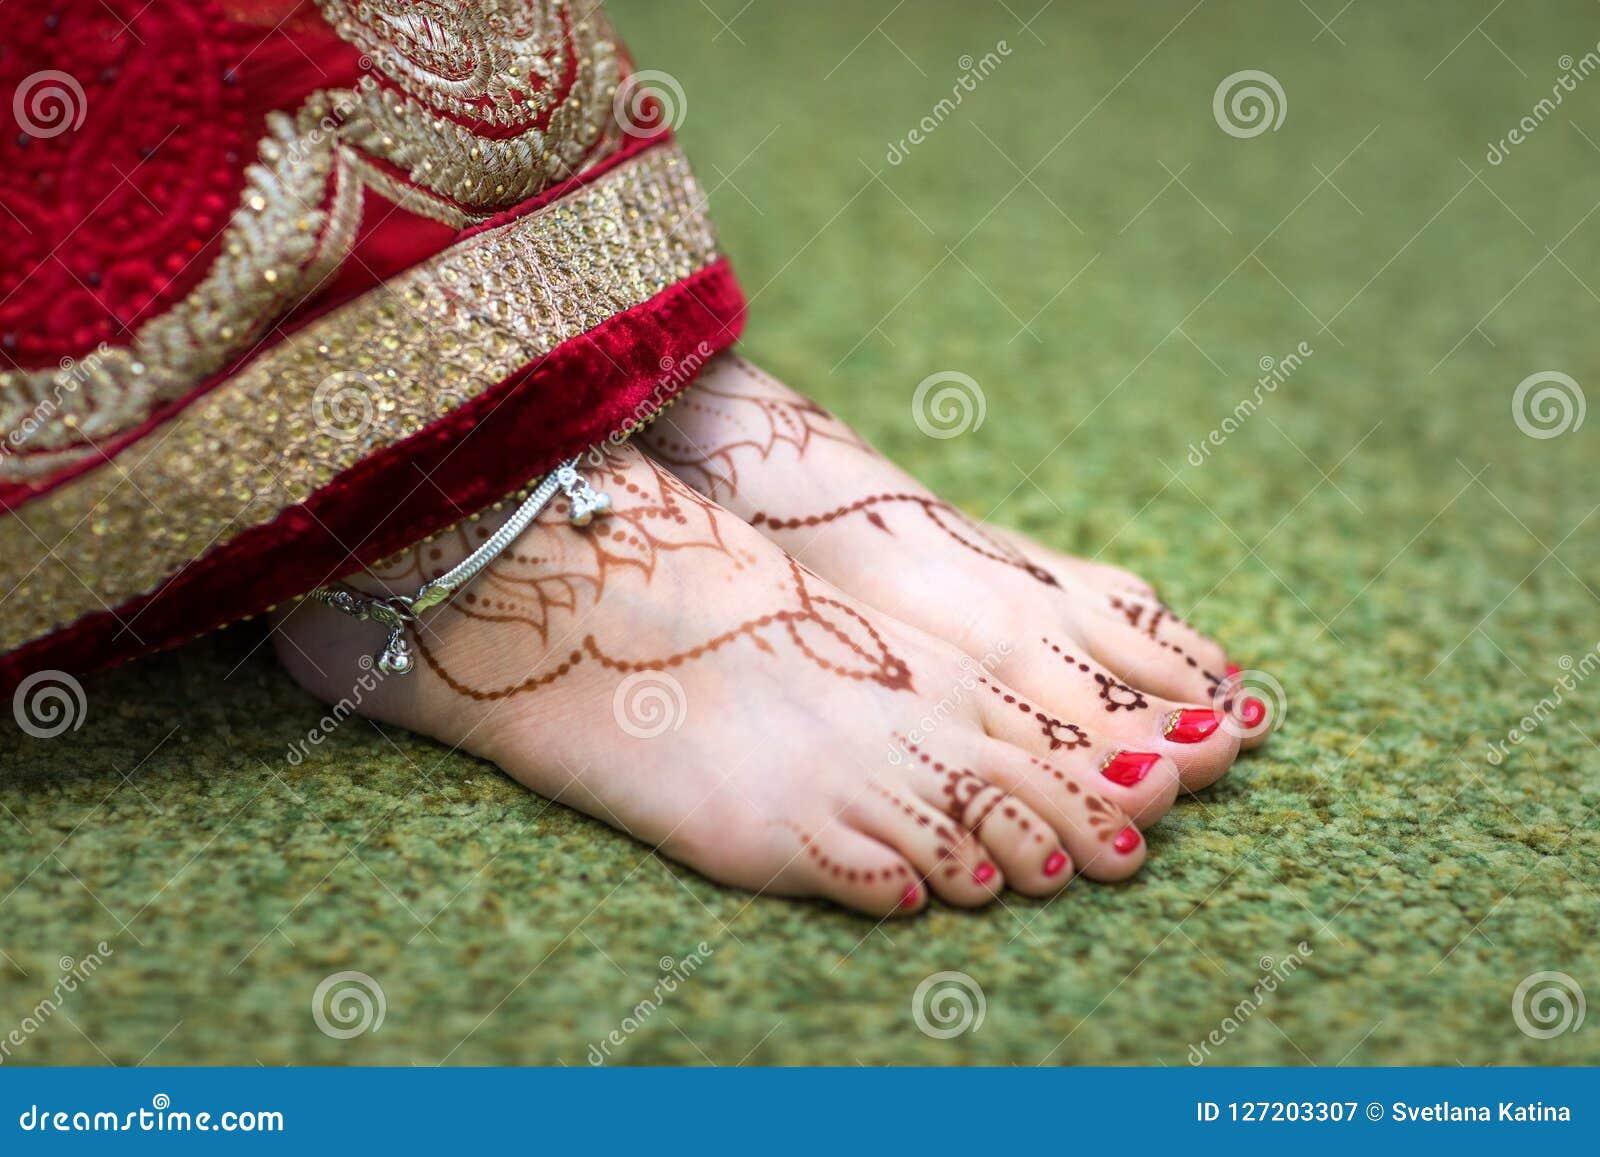 Indian Mehndi Painting On The Foot Feet Girls